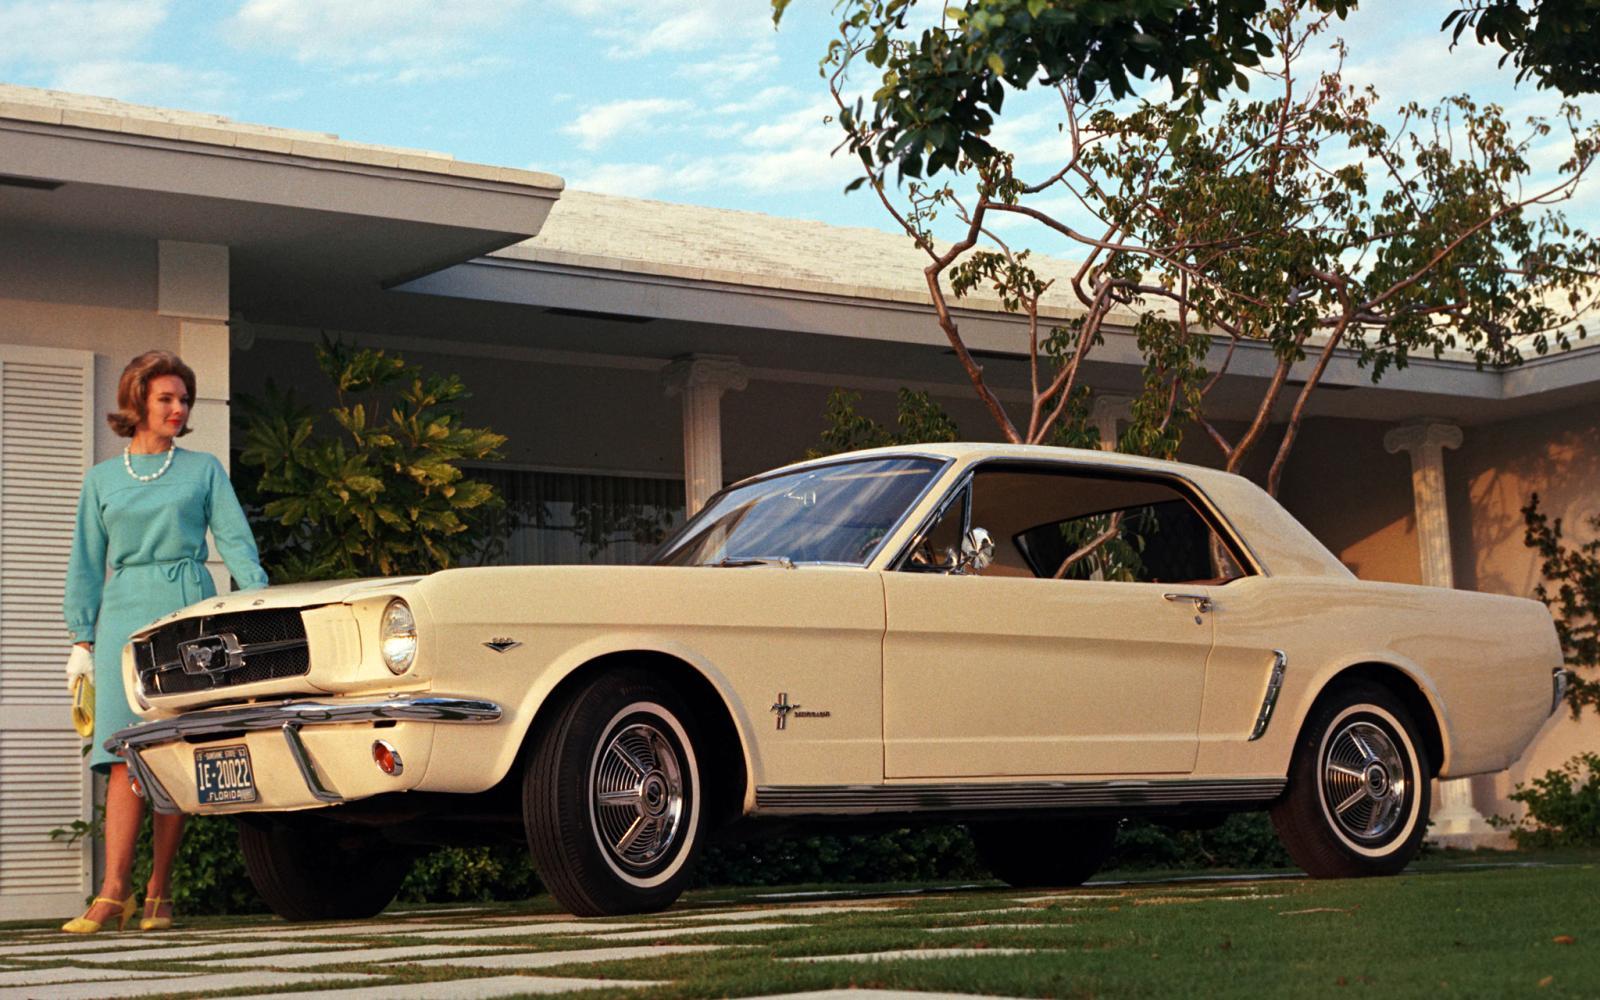 Wist je dit over de Ford Mustang?